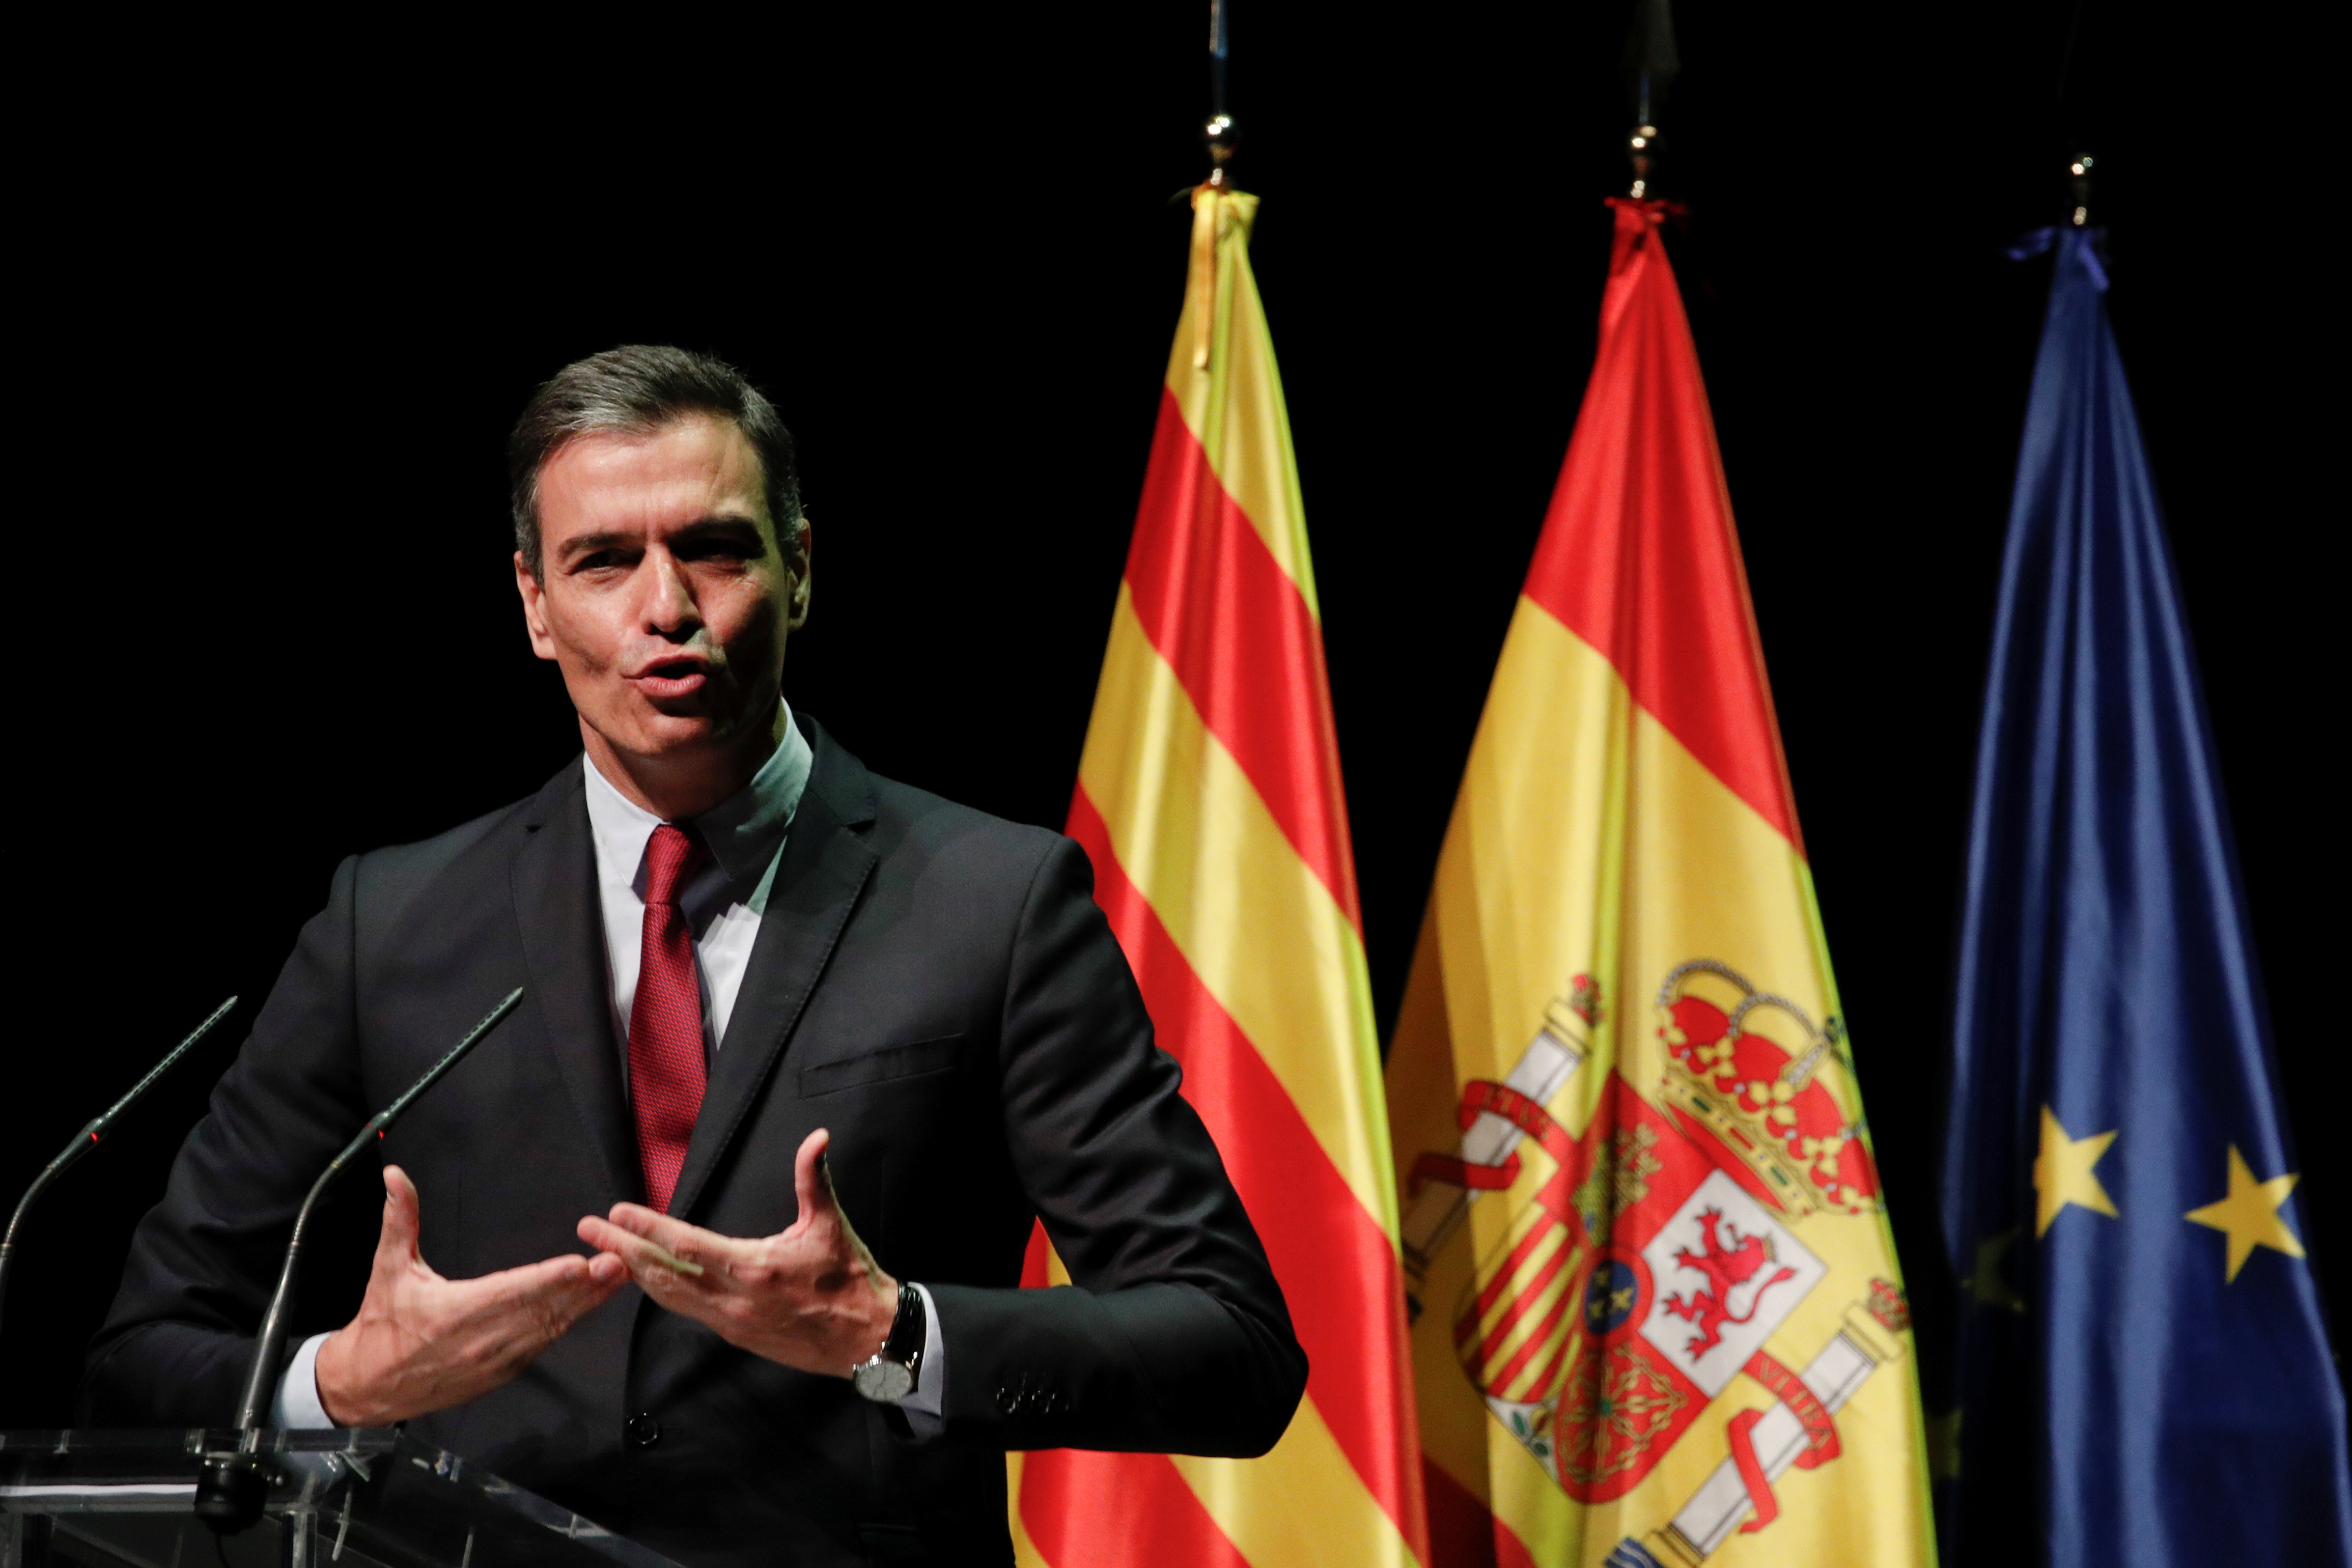 Spain's Prime Minister Pedro Sanchez gestures as he explains his plan to issue pardons to a dozen Catalan separatist leaders, at Gran Teatre del Liceu, in Barcelona, Spain, June 21, 2021. REUTERS/Albert Gea